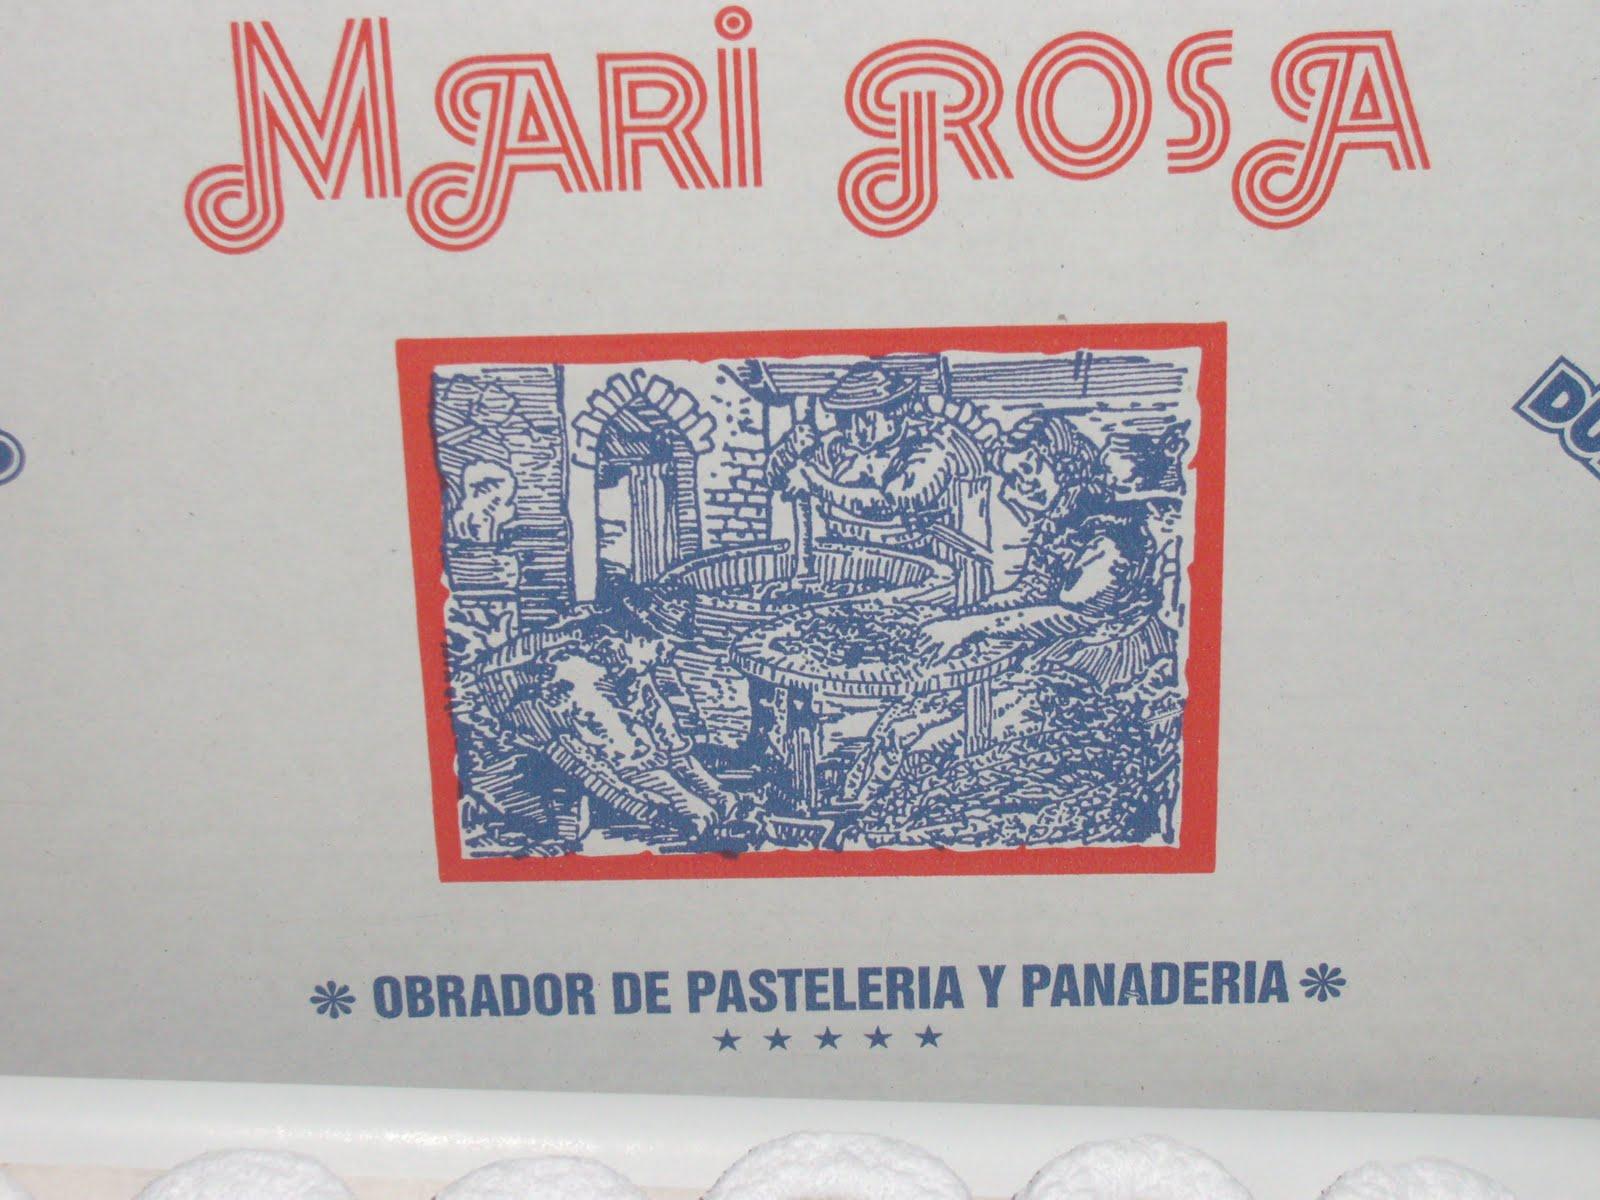 Productos Mari Rosa